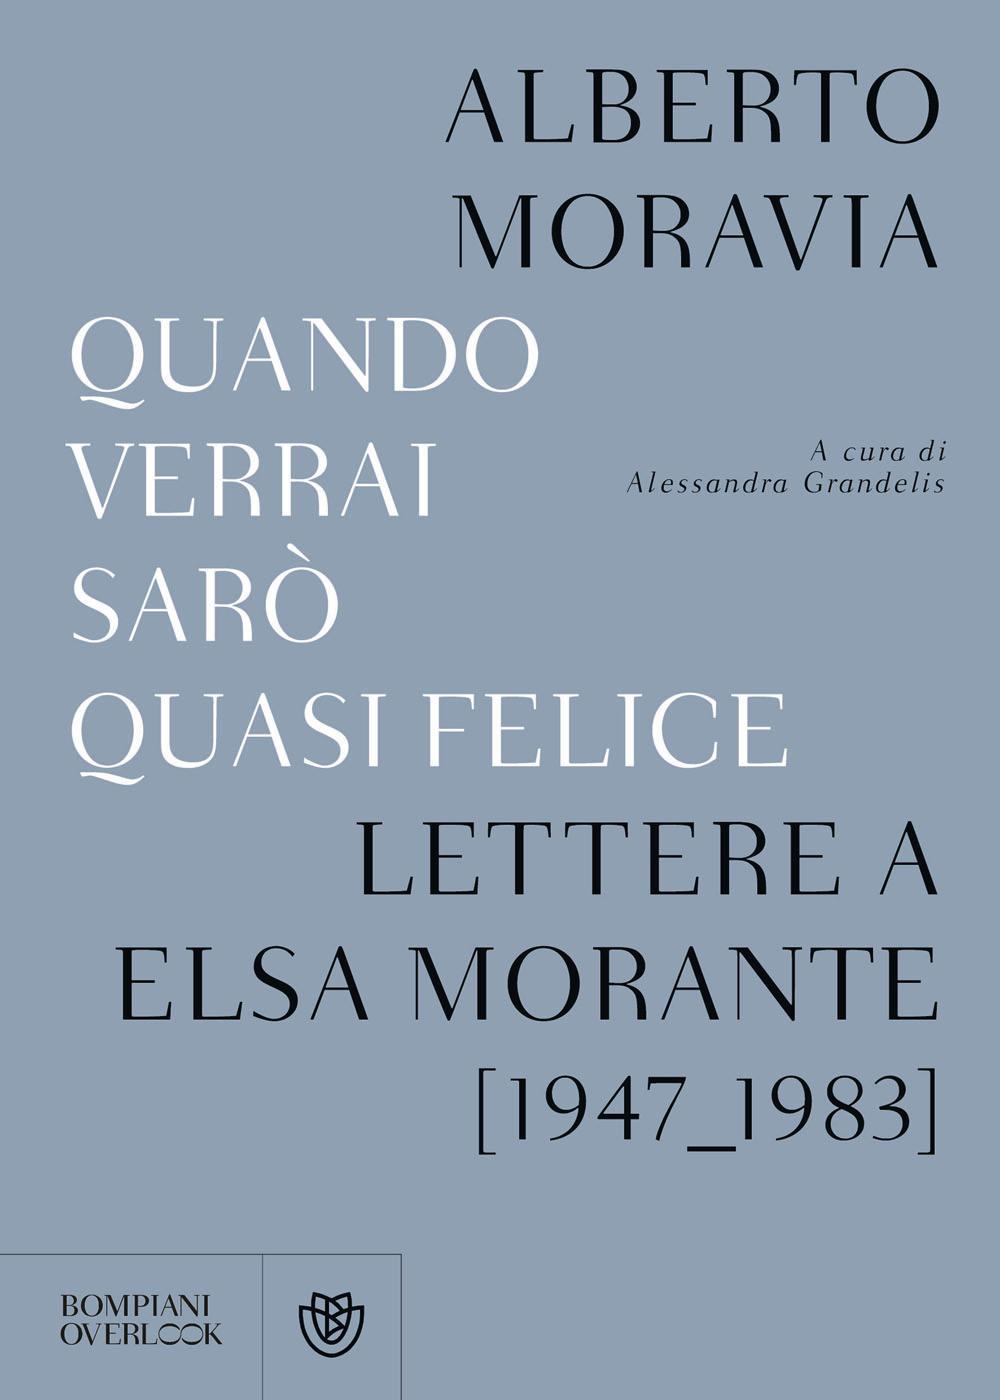 Quando verrai sarò quasi felice. Lettere a Elsa Morante (1947-1983)